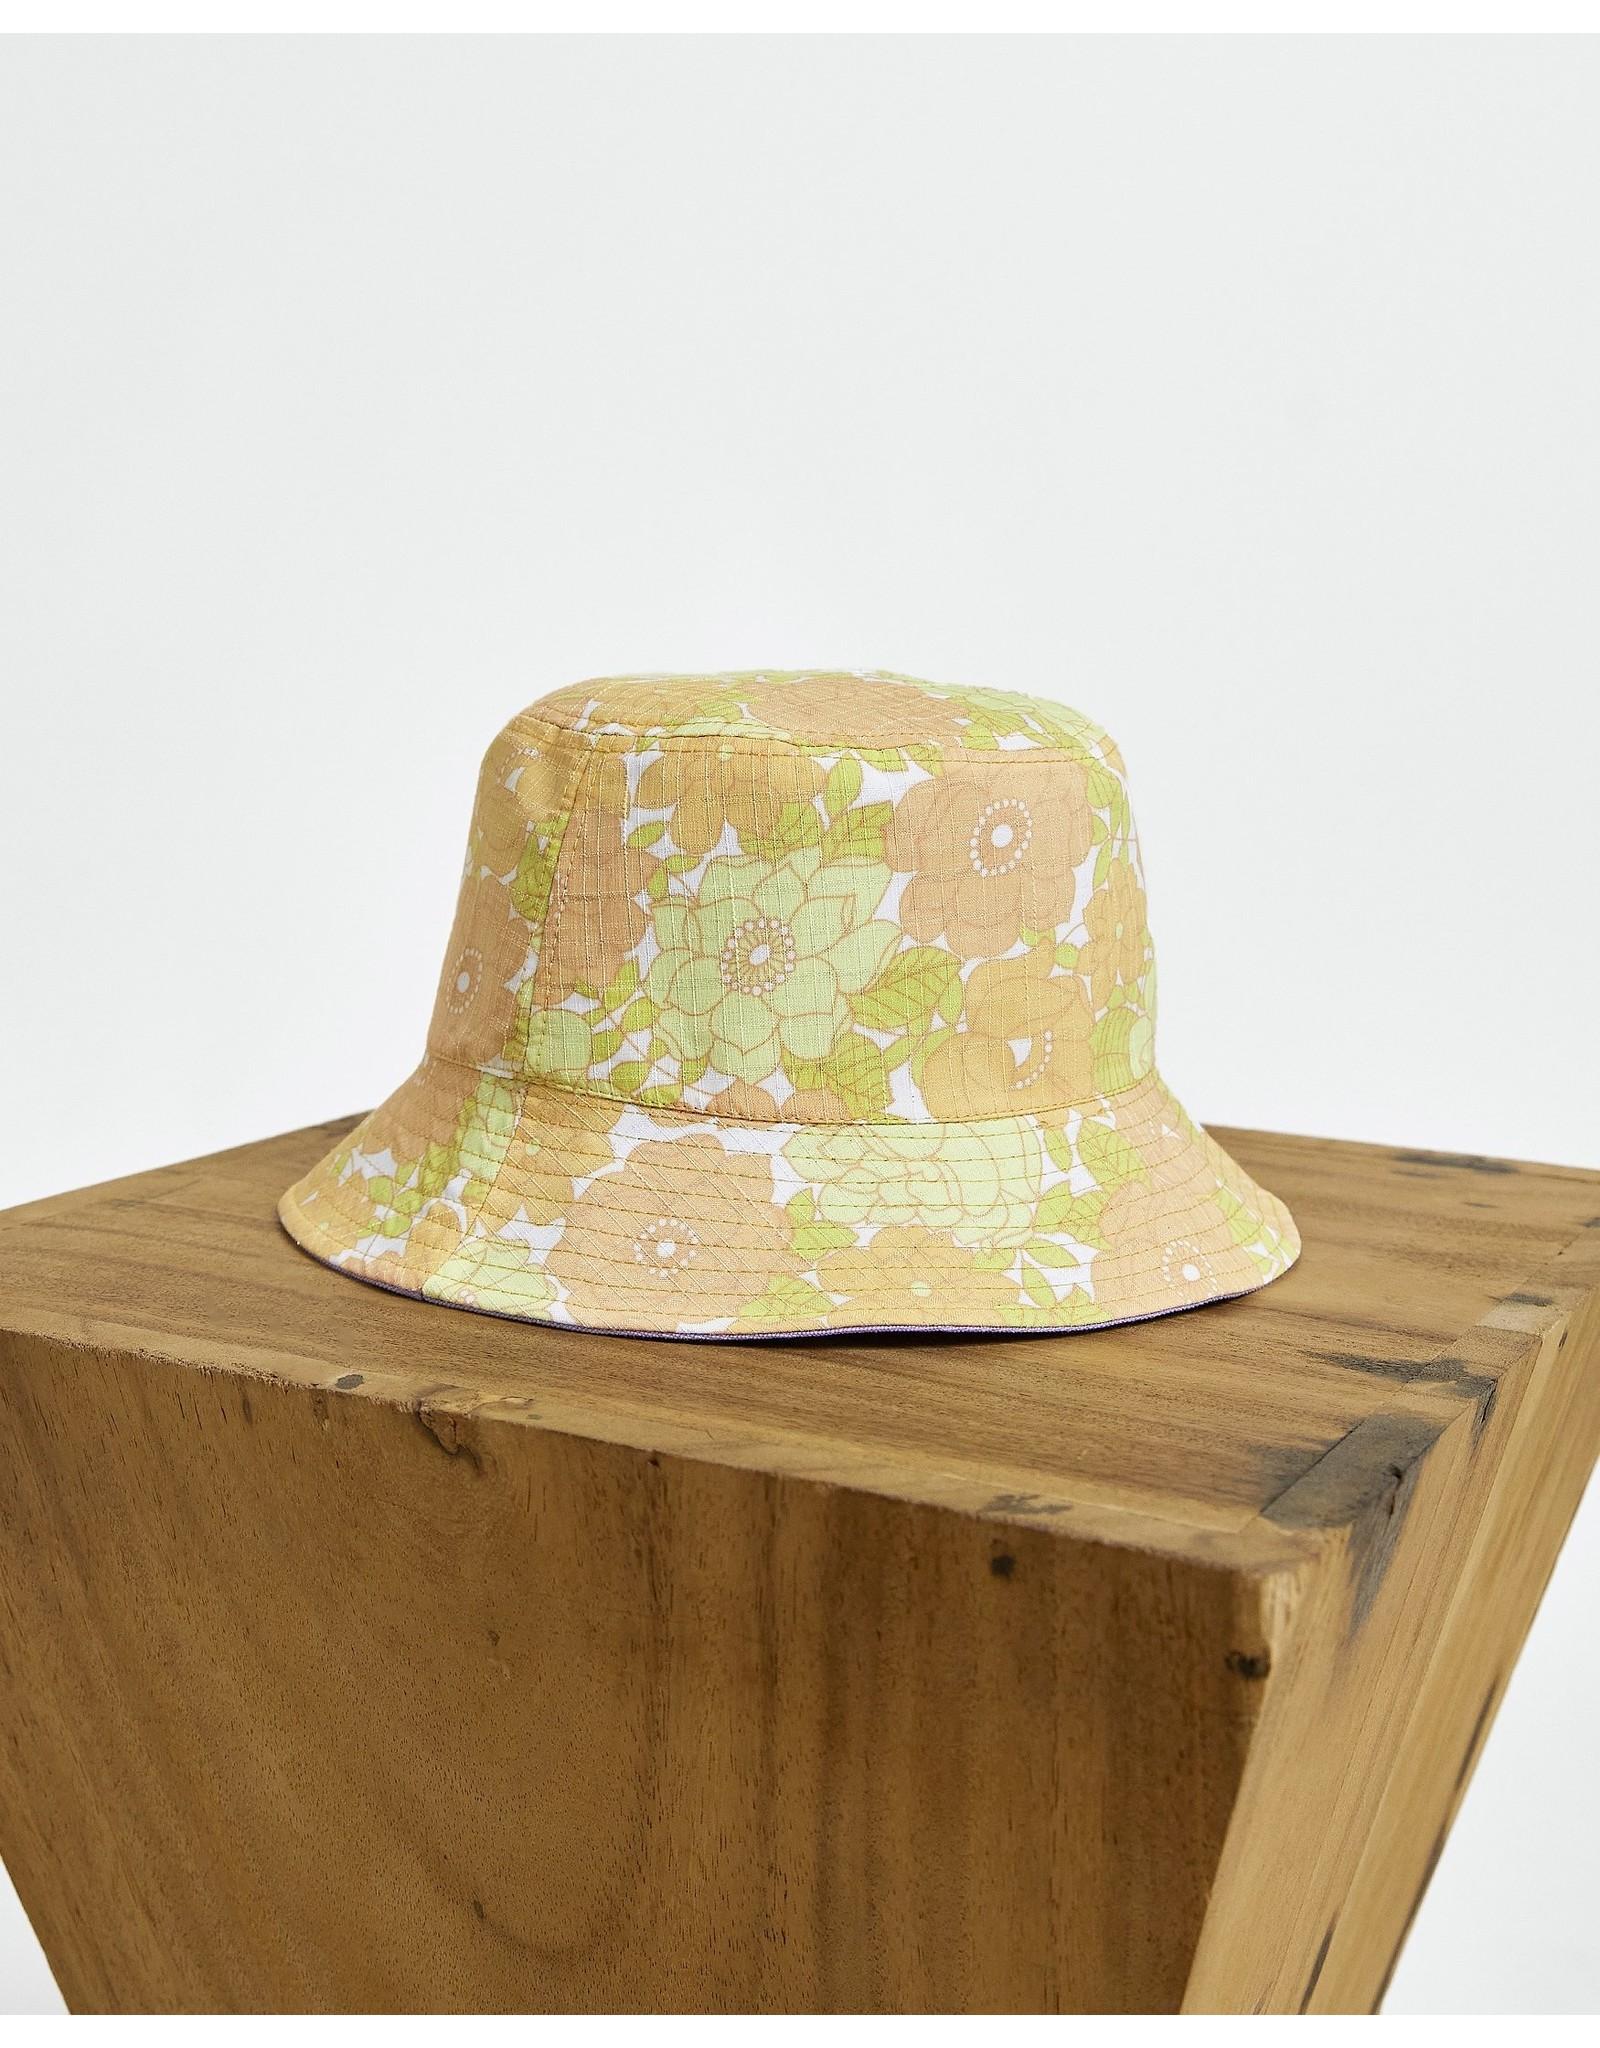 Les Coyotes de Paris LCDP Perry floral hat